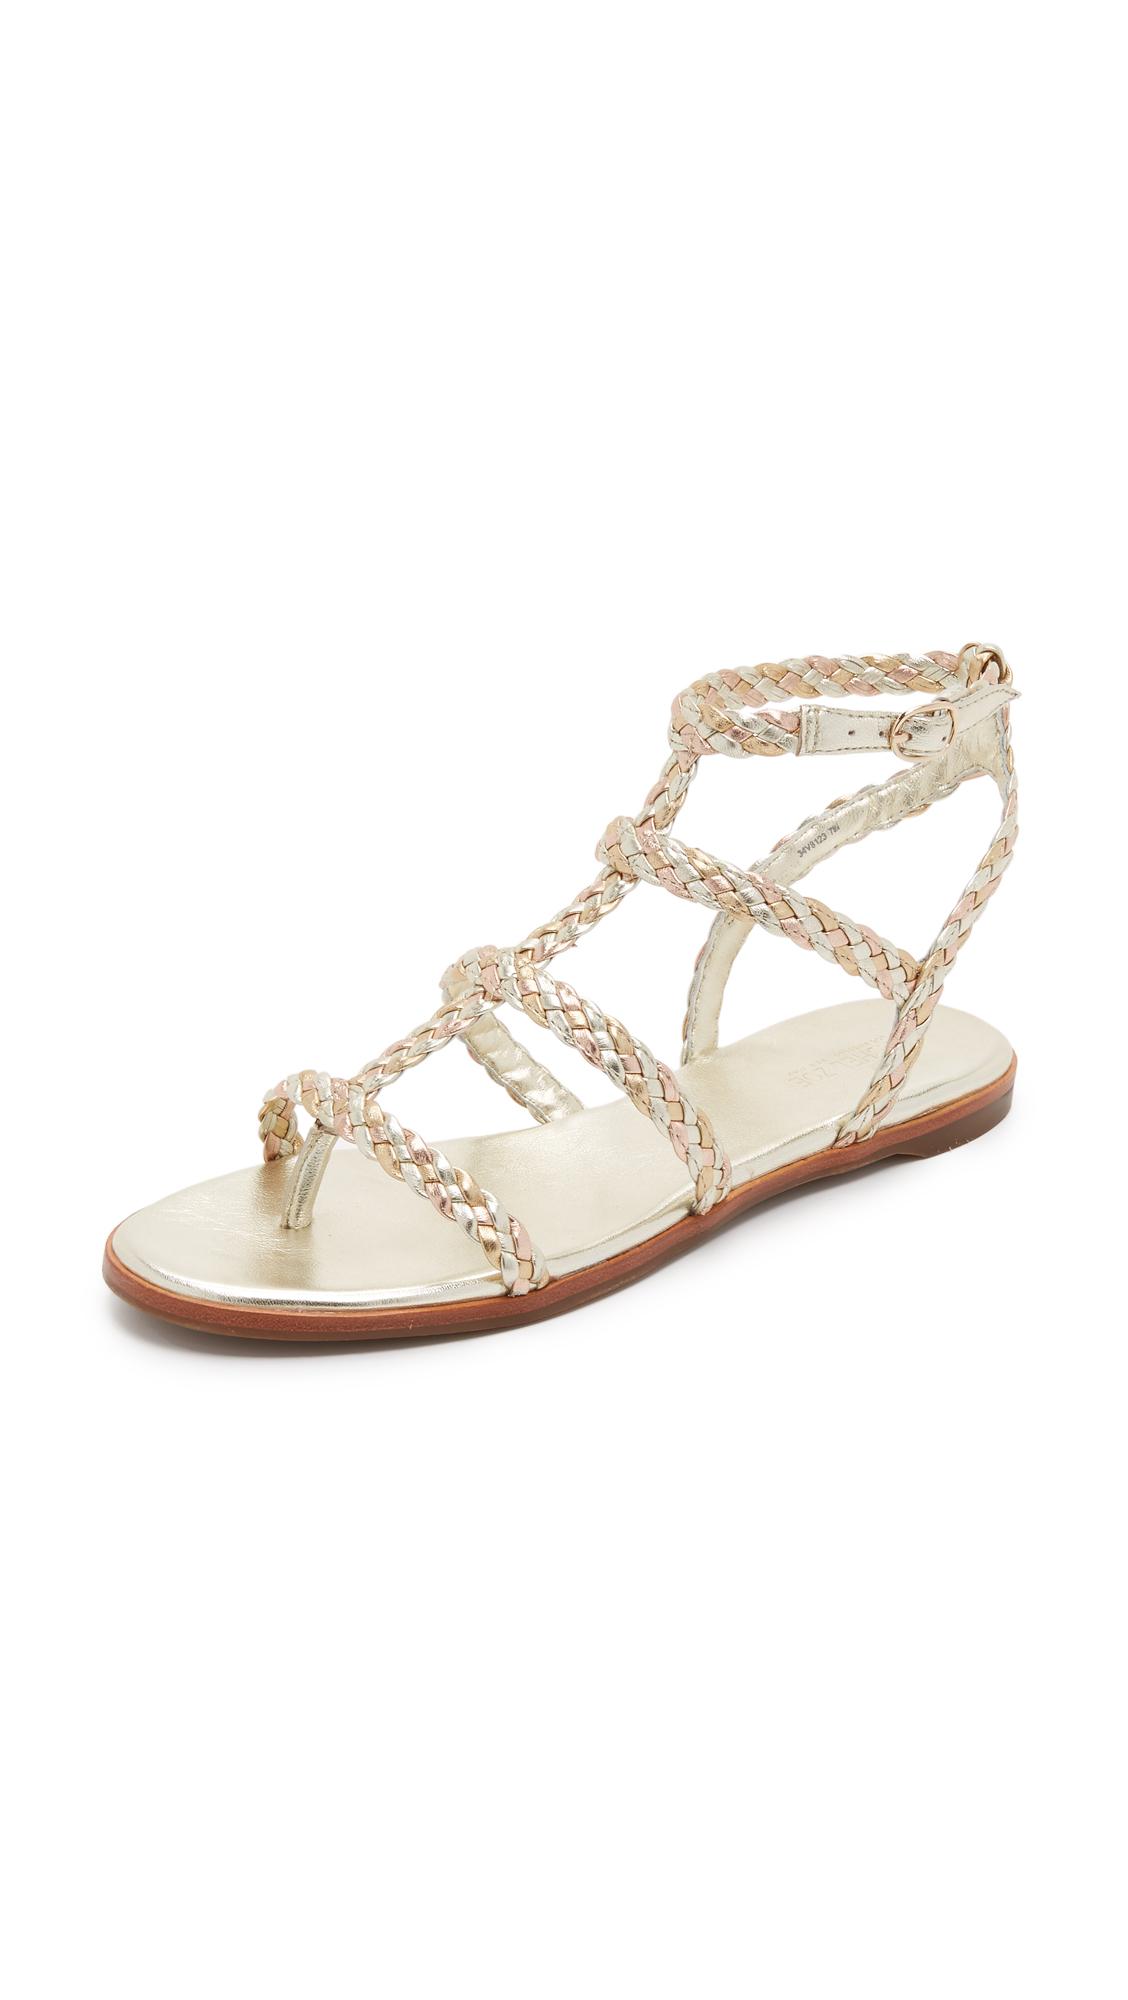 f7a1e4926 Rachel Zoe India Flat Sandals on PopScreen